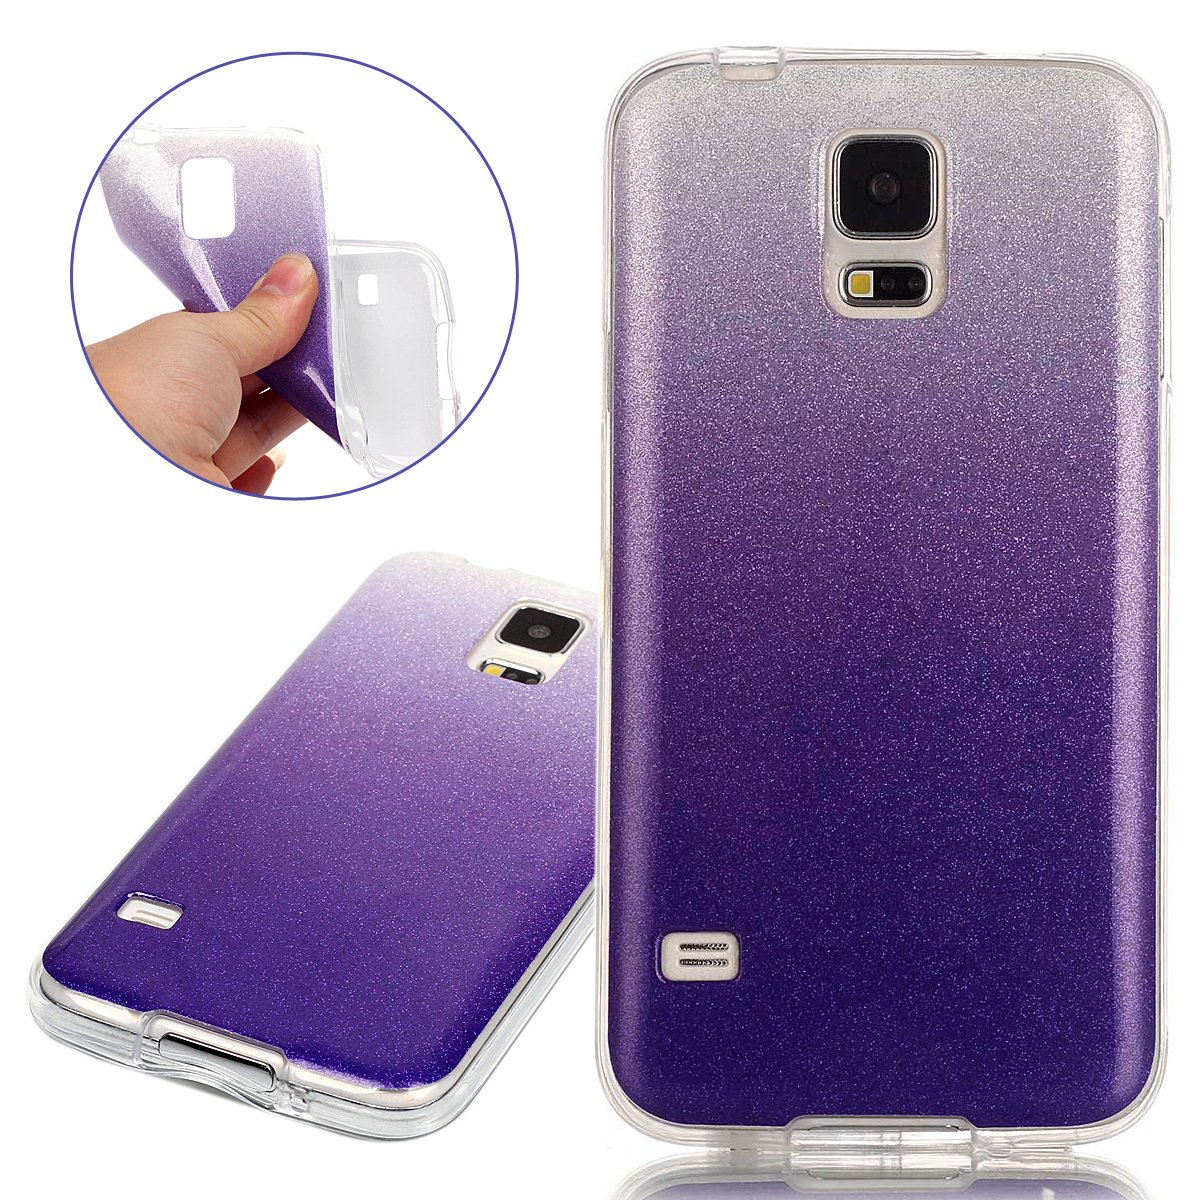 Samsung Galaxy S5 Cover Custodia Shock-Absorption Bumper Cover e Anti-Graffio Trasparente Ultra Slim Hard Back Case Soft TPU Cover ISAKEN Galaxy S5 Neo Custodia Flower Rosa